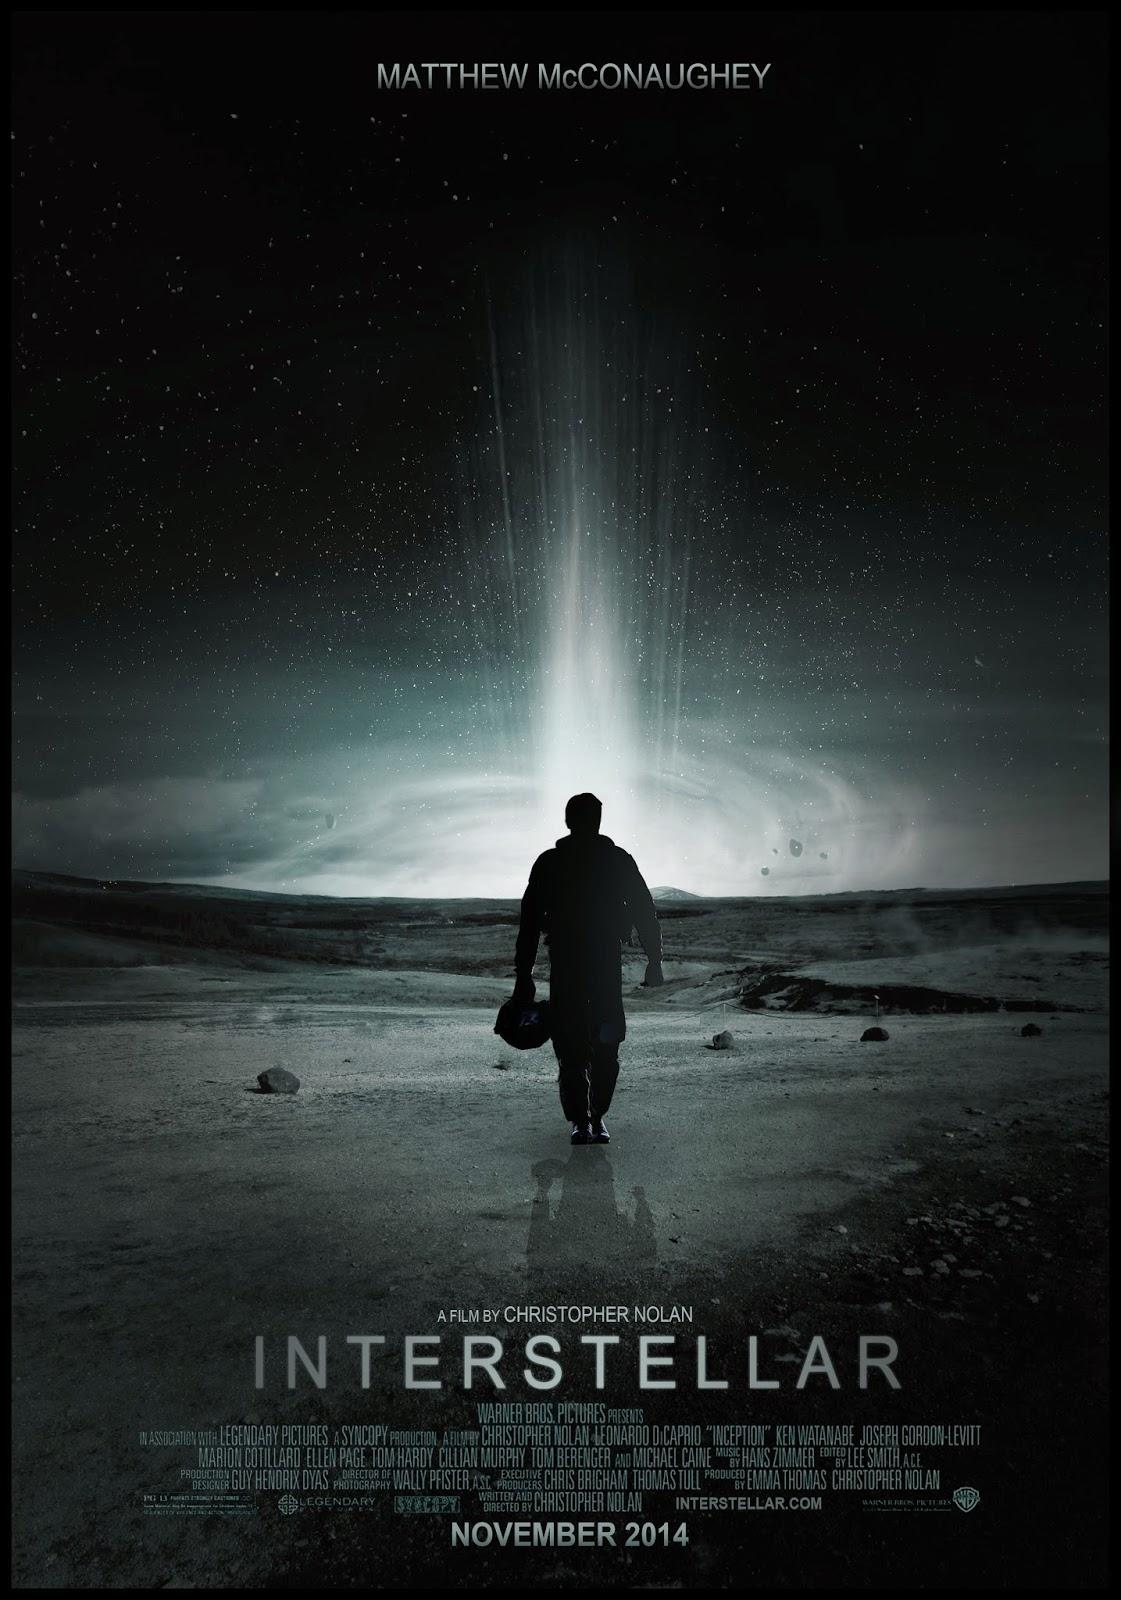 Movie Wallpaper HD: Interstellar (2014) Movie Poster ...  Movie Wallpaper...